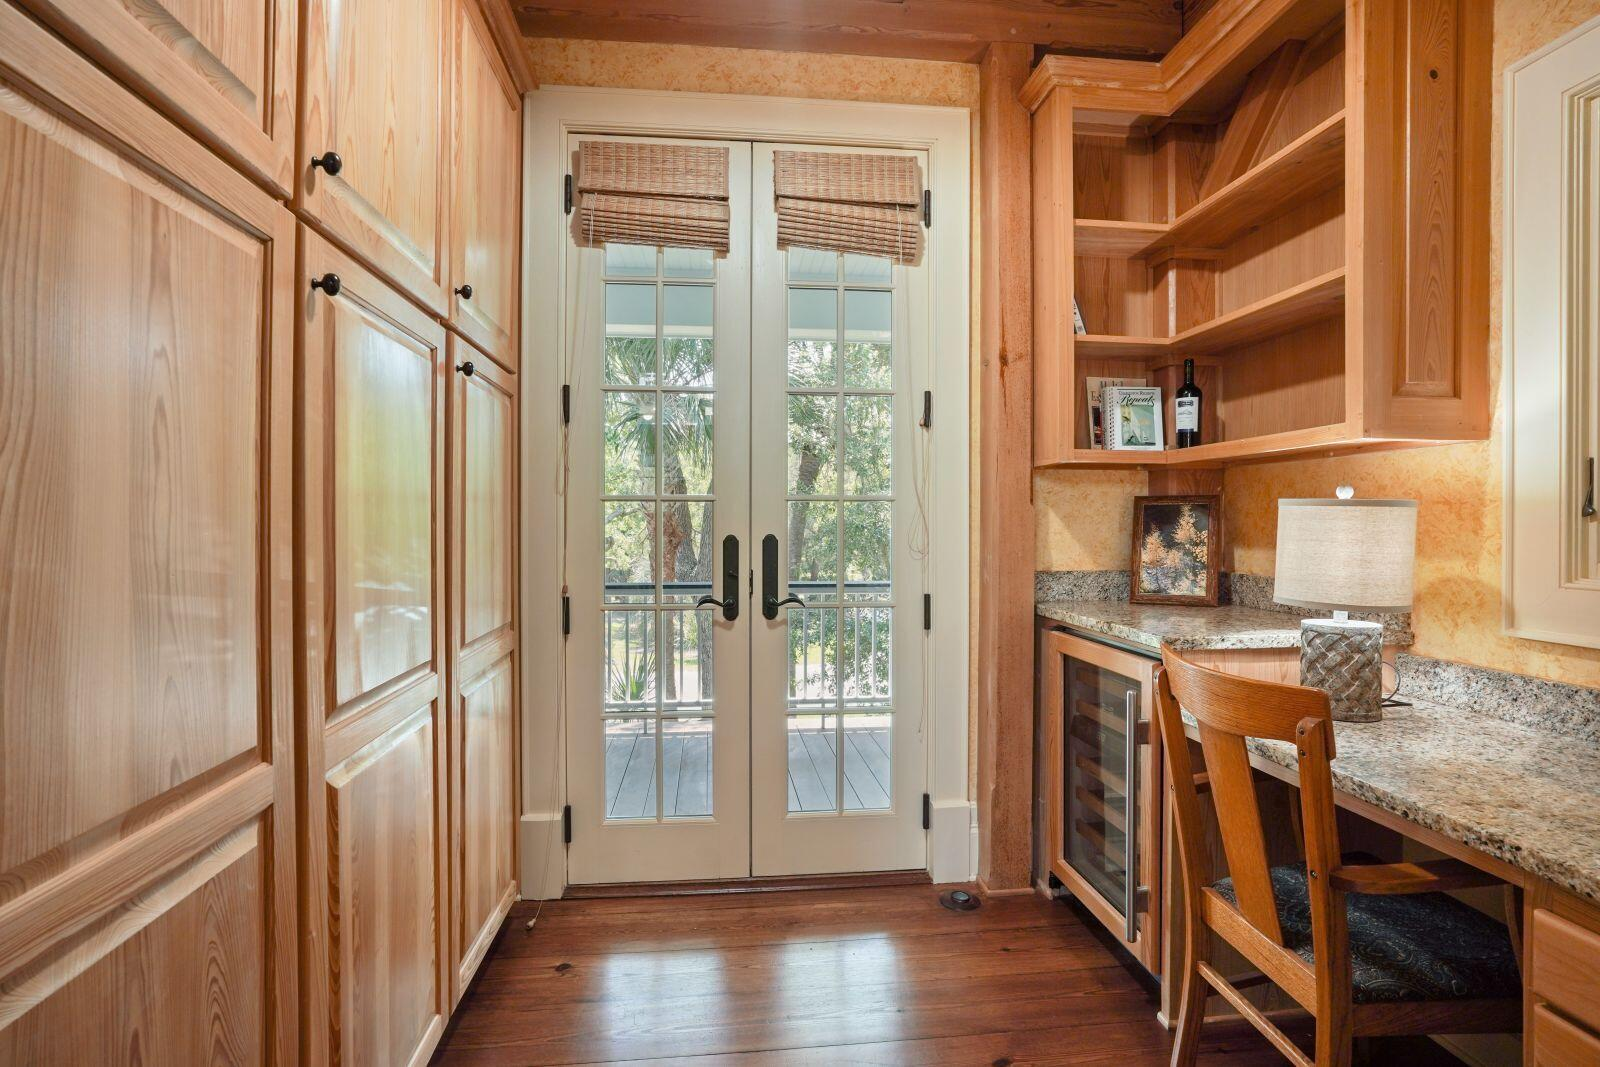 Wyndham Homes For Sale - 5 Heron, Edisto Beach, SC - 106